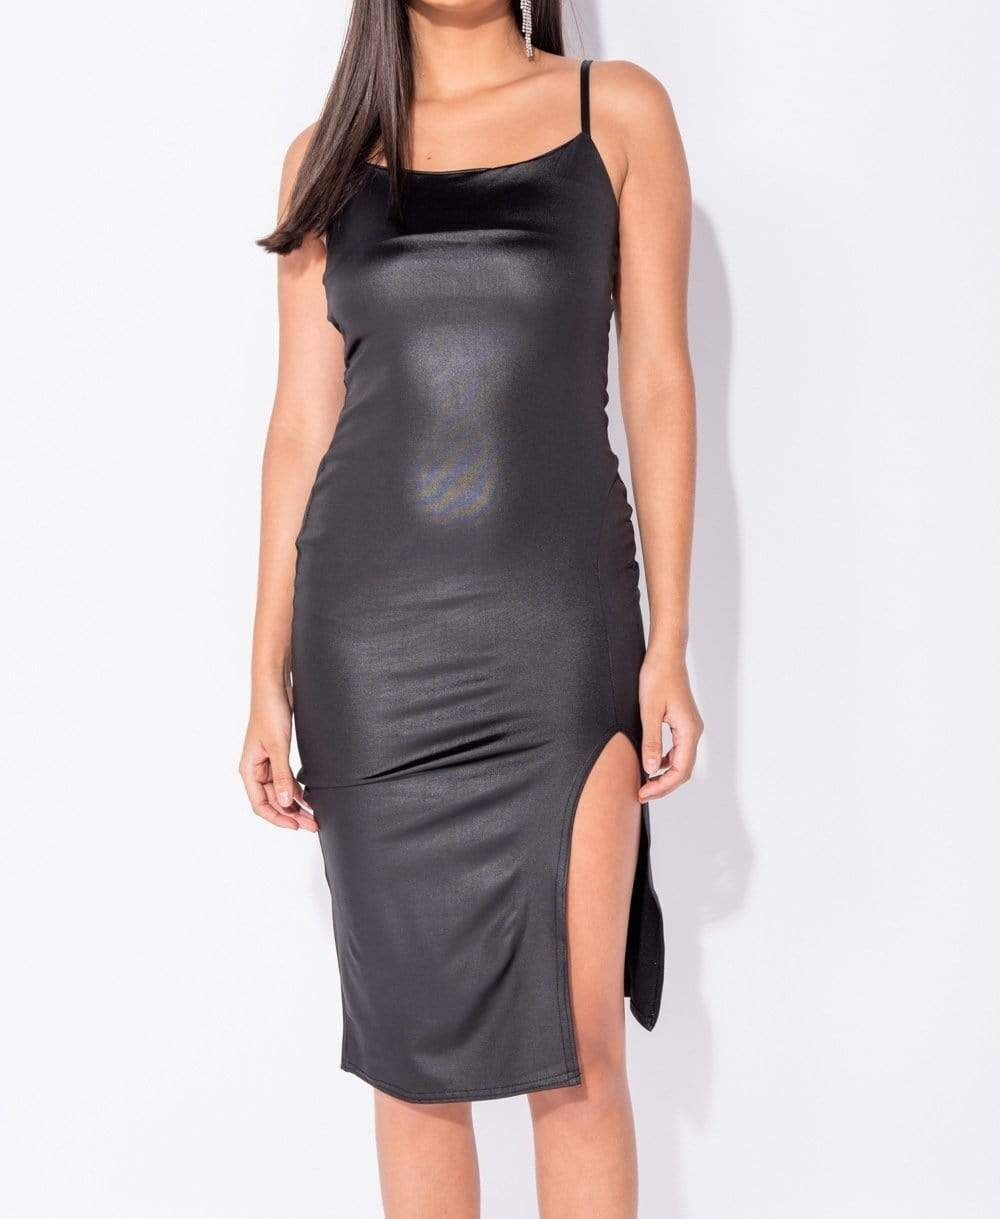 Wet Look Thigh Split Bodycon Midi Dress She S Dolled Up Midi Dress Bodycon Bodycon Midi Bodycon Dress [ 1219 x 1000 Pixel ]